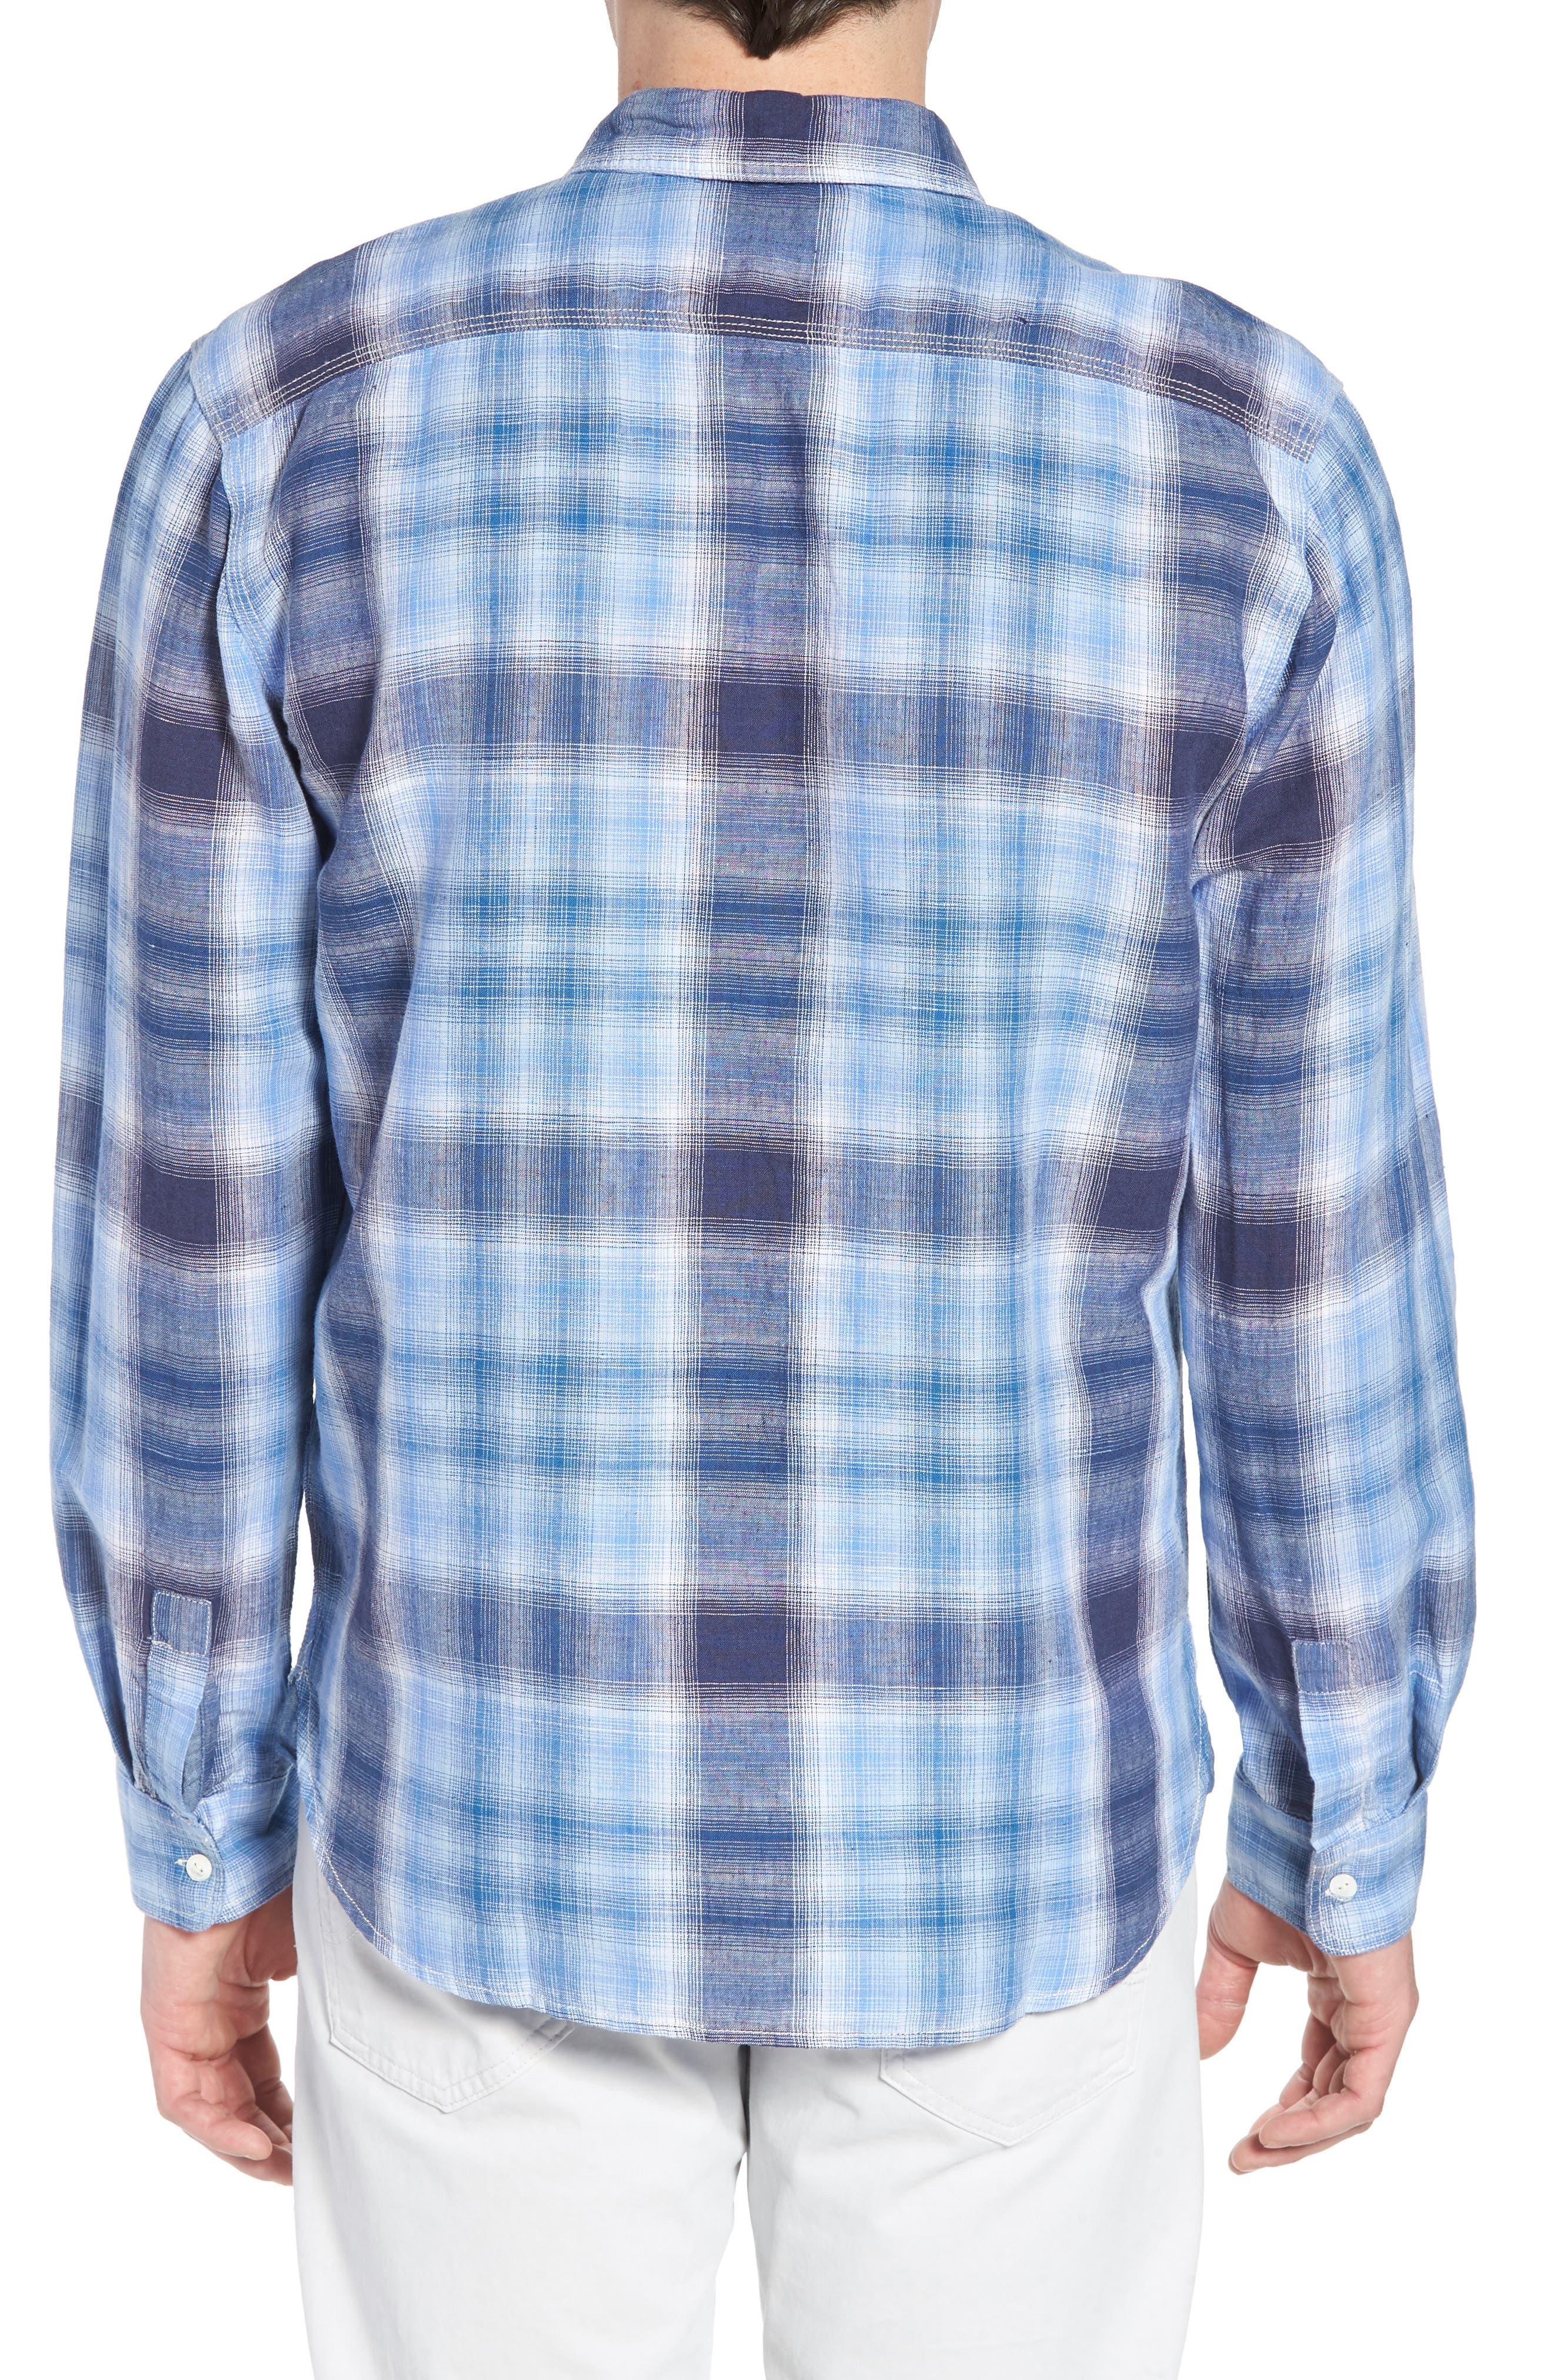 Trestles Linen & Cotton Sport Shirt,                             Alternate thumbnail 2, color,